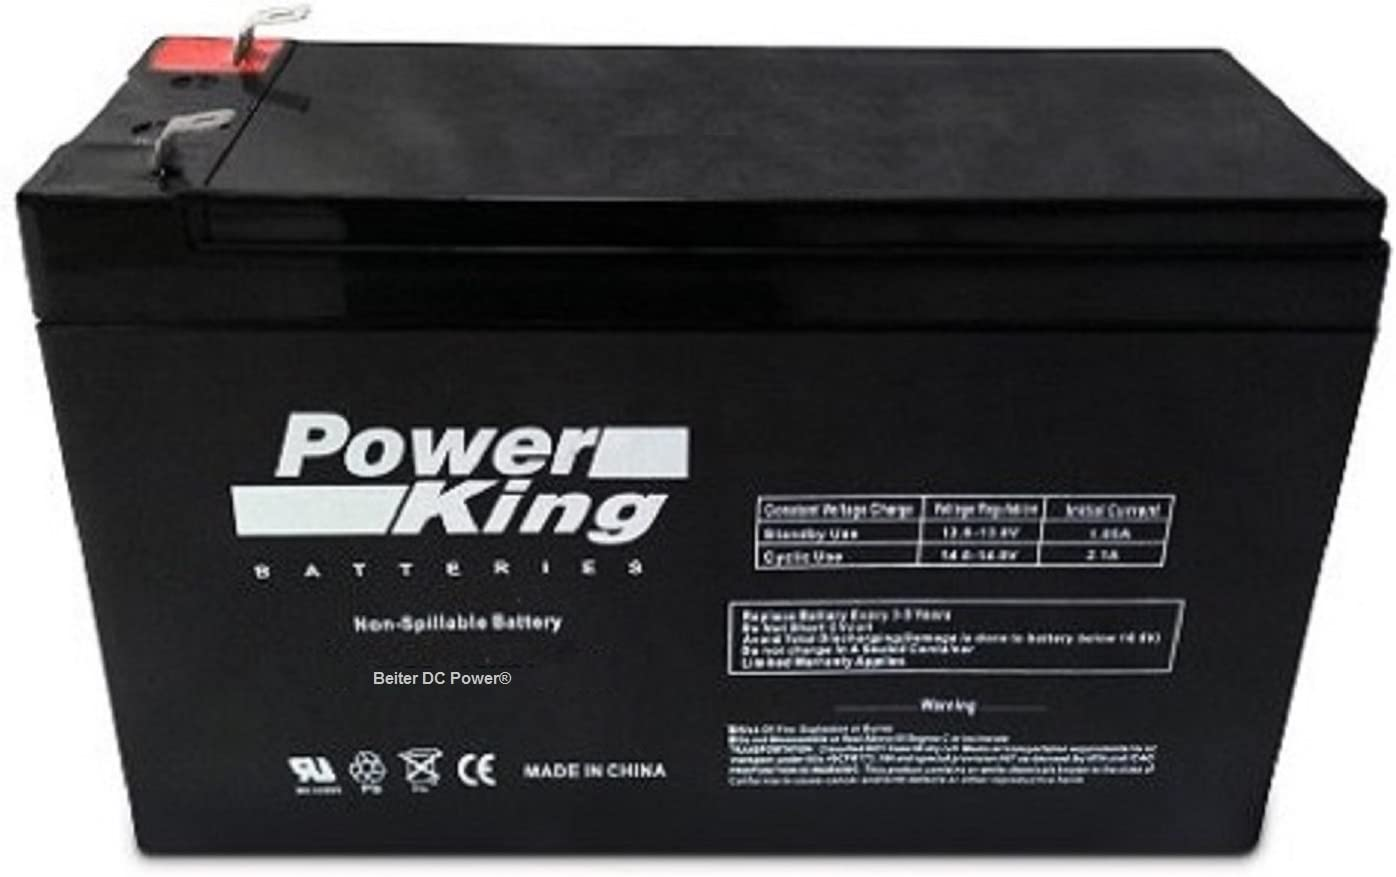 Compatible APC Back-UPS ES 500VA UPS Series Replacement Battery for Model BE500C